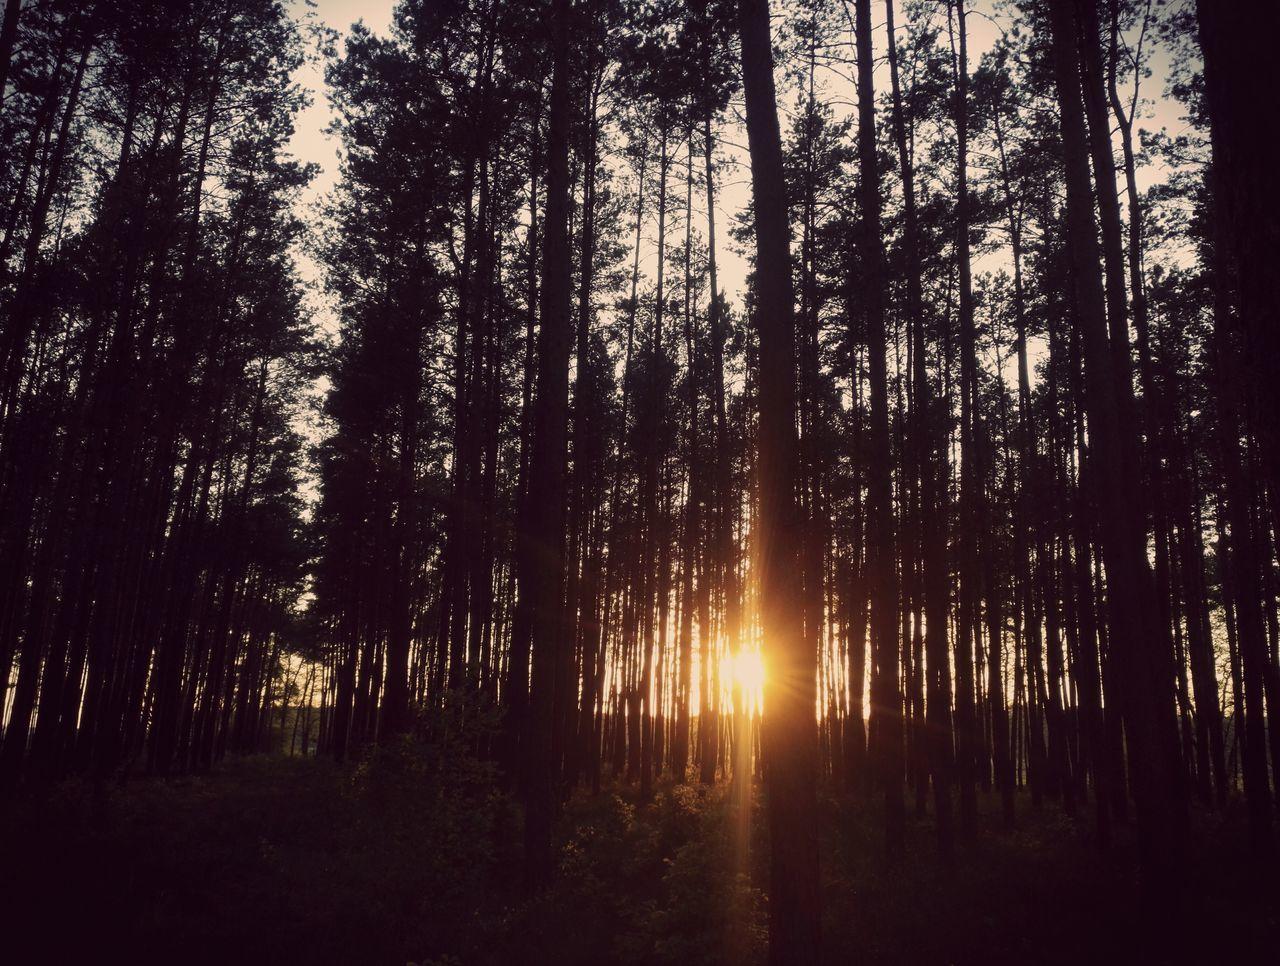 223. Tree Forest Sunlight Nature Back Lit Sunset Silhouette Scenics Sun No People Landscape EyeEm Best Shots TreePorn Mobilephotography Telephone Photography Sky And Trees EyeEm Masterclass Eyeem Photography EyeEmbestshots EyeEmNewHere EyeEmBestPics EyeEm Best Edits Himmel Outdoors Sky